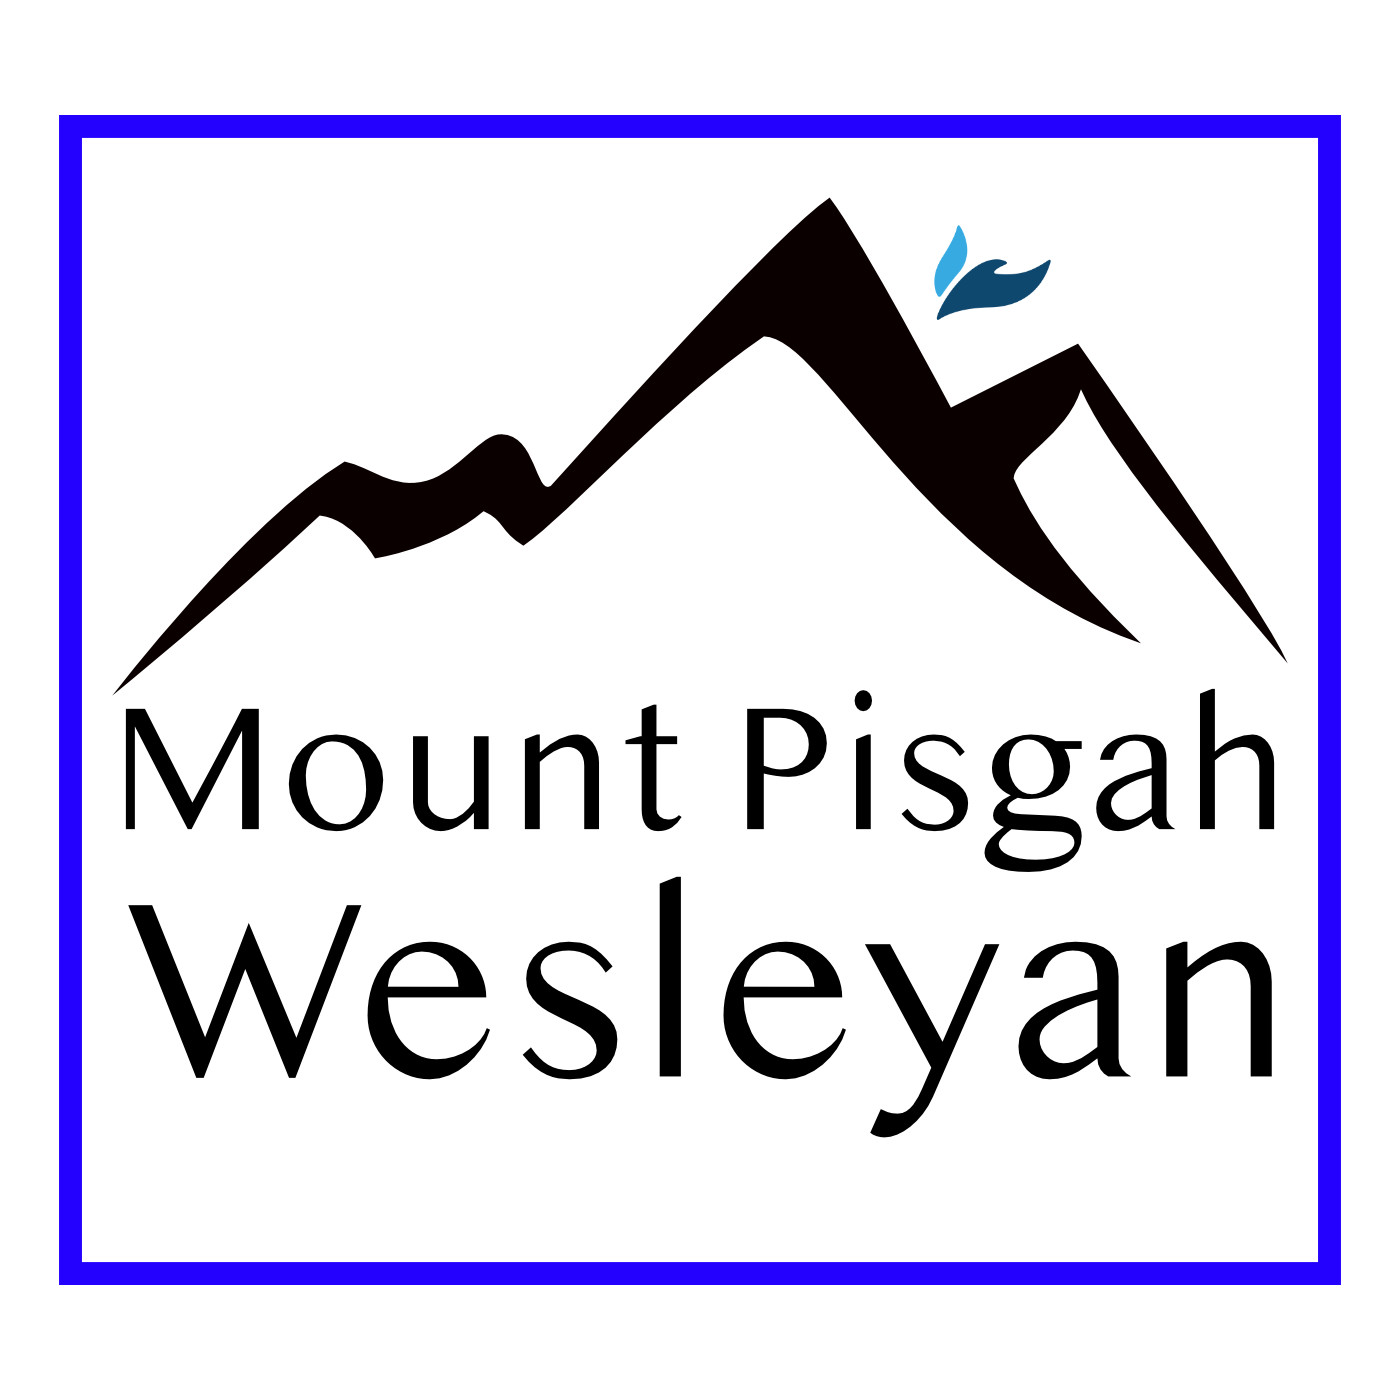 Mt. Pisgah Wesleyan Sermon Podcast